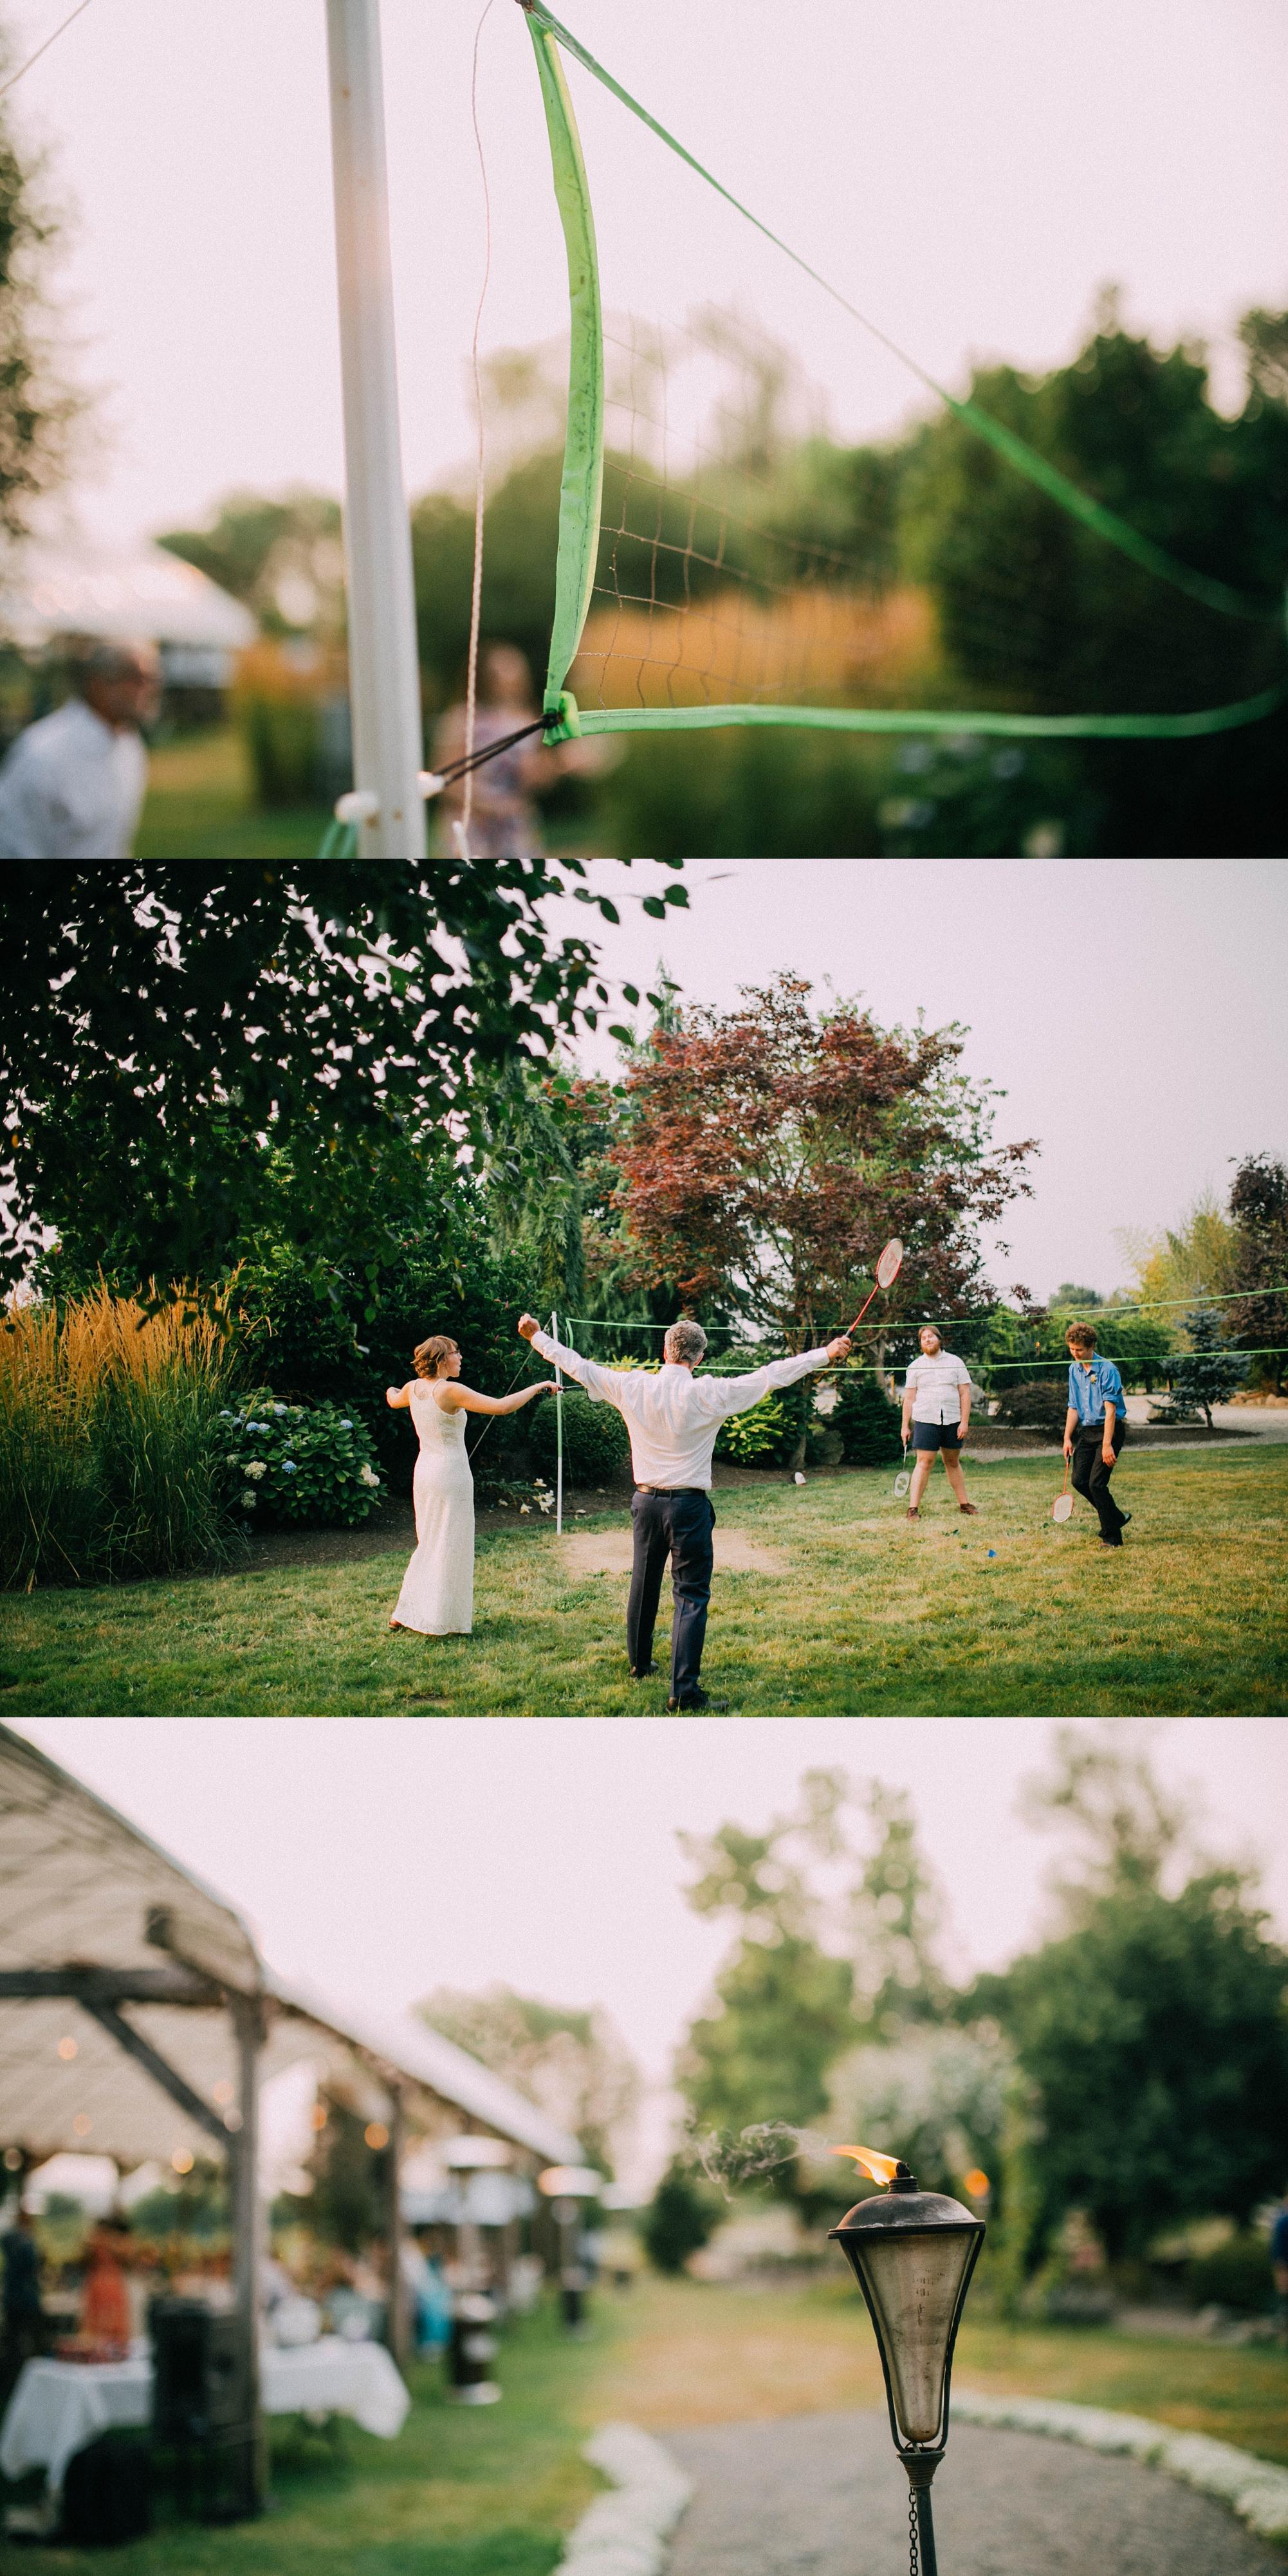 ashley_vos_seattle_ wedding_photographer_0473.jpg